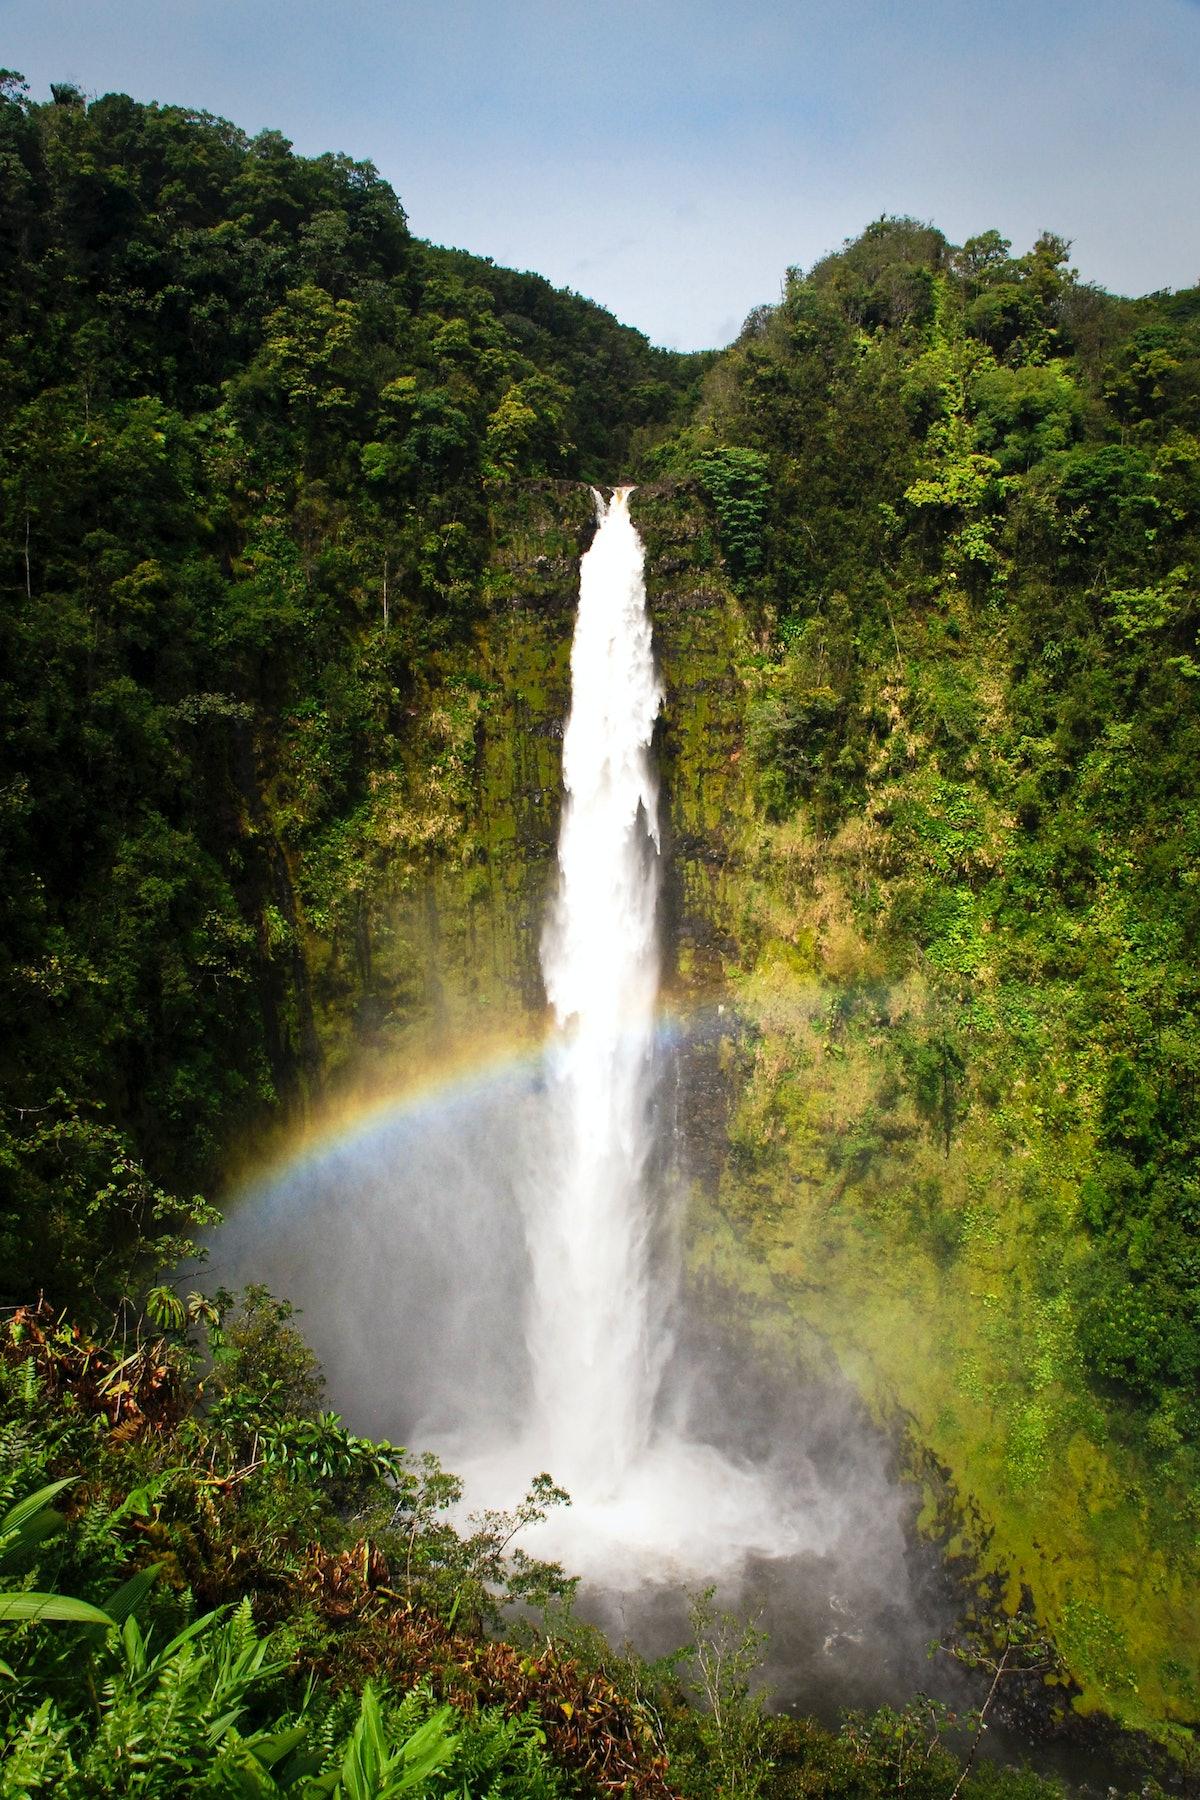 Best Vacation Spot: Akaka Falls on the Big Island of Hawaii